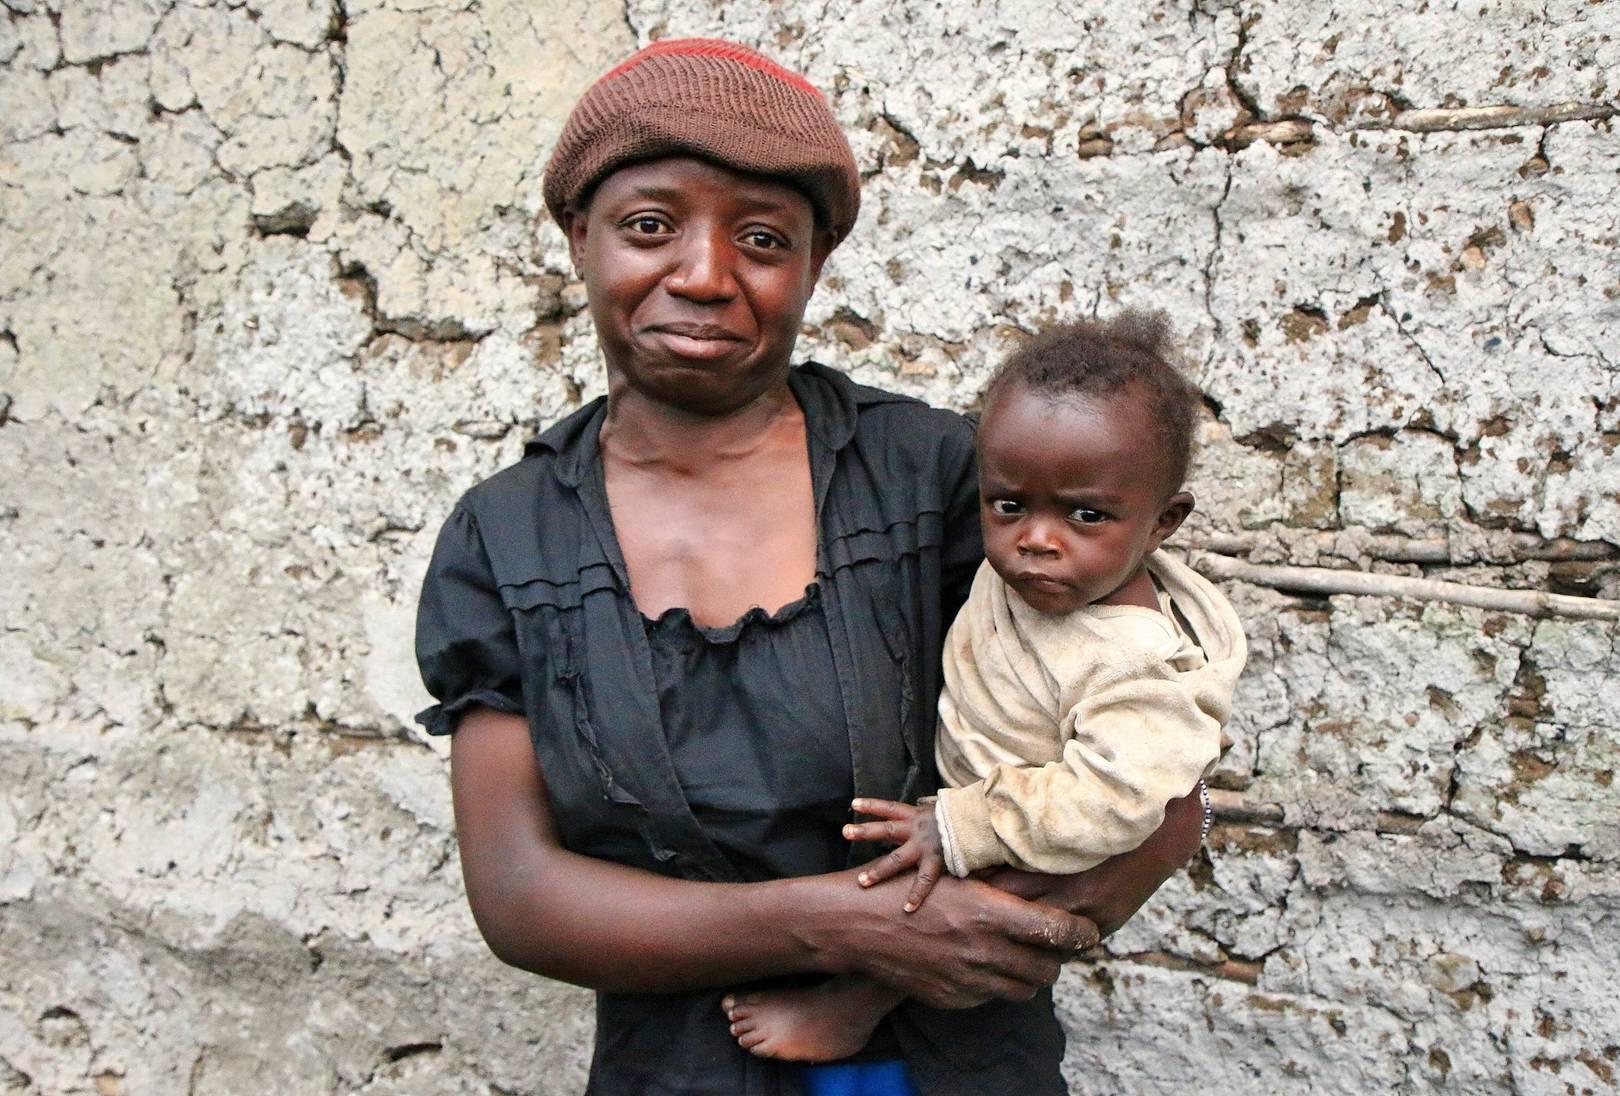 Дети африки все фото